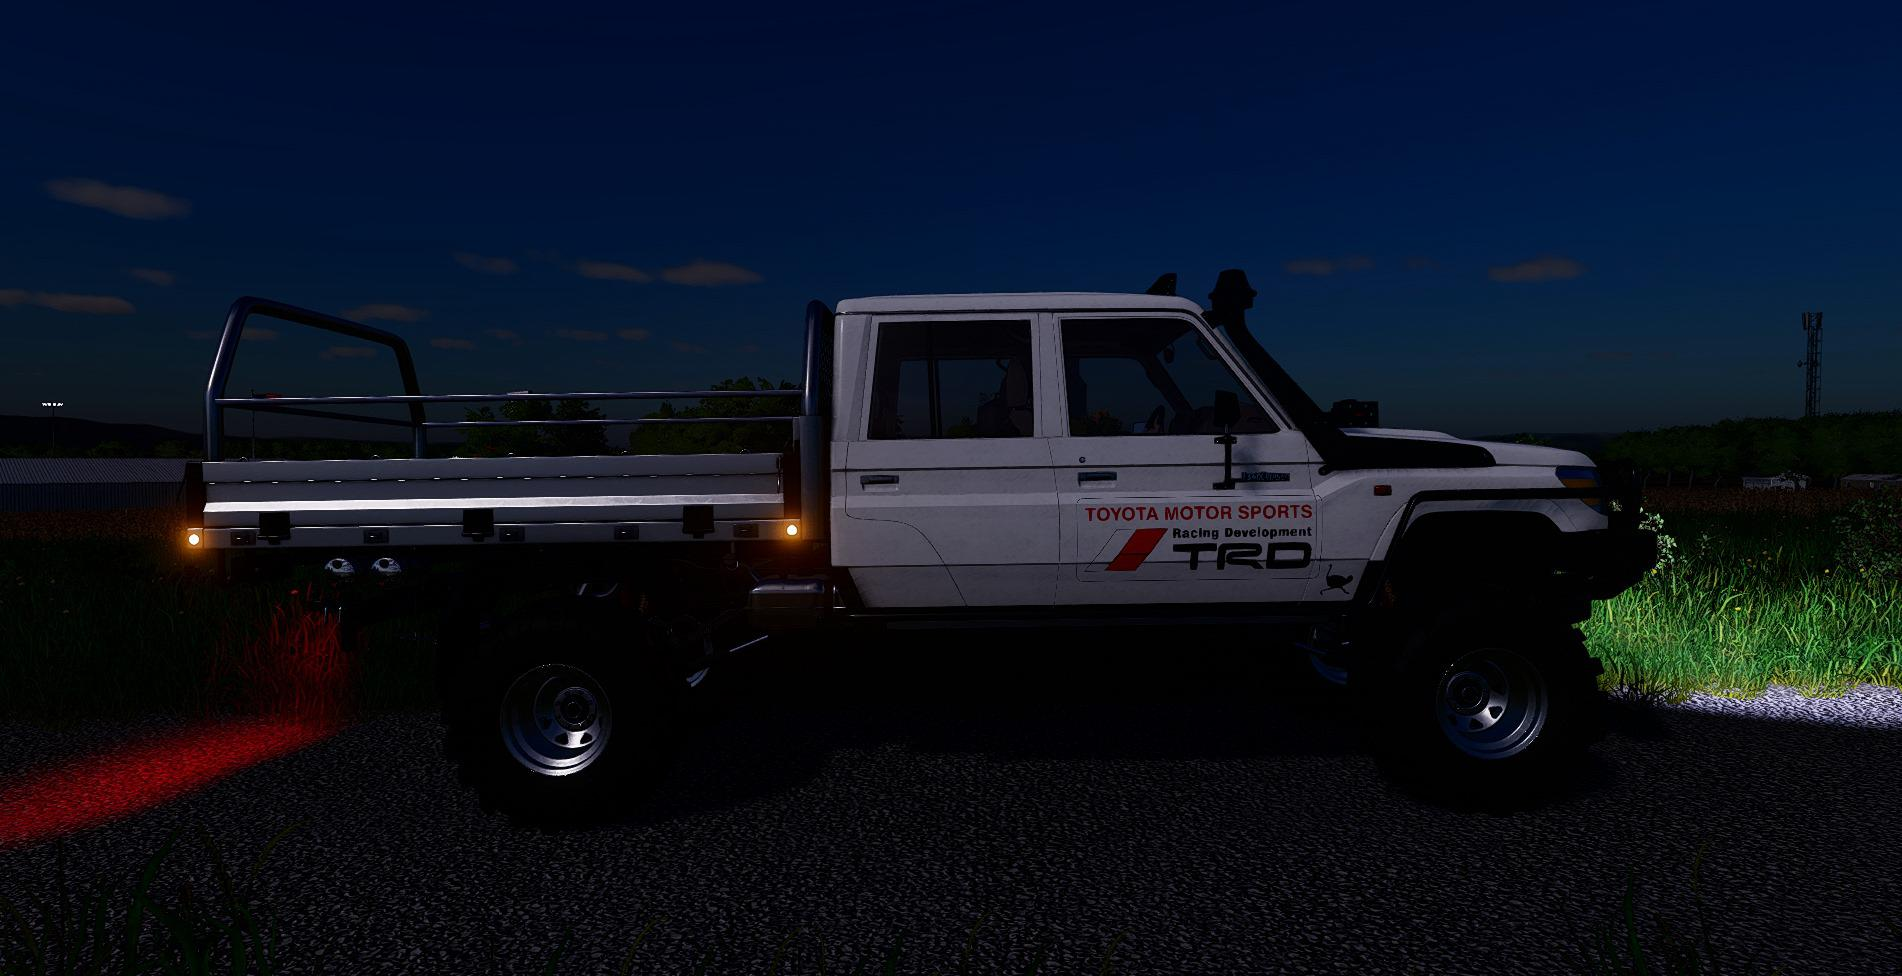 Toyota Land Cruiser 70 >> Toyota Land Cruiser 70 v 1.0 | FS19 mods, Farming simulator 19 mods